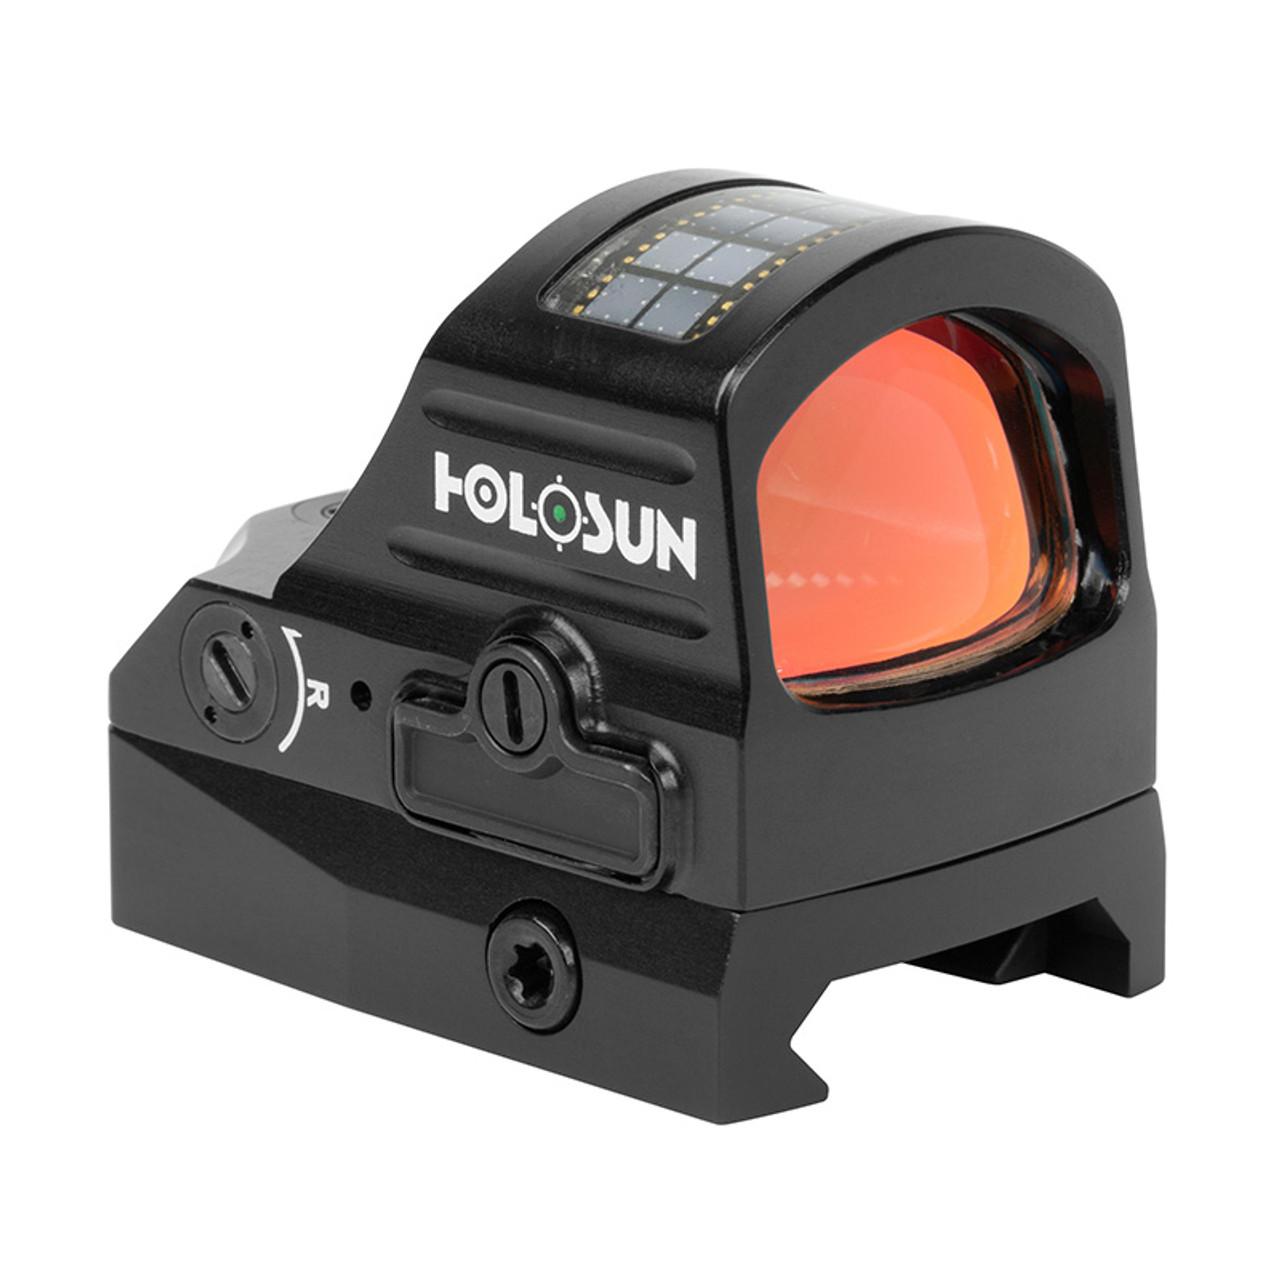 HOLOSUN 507C X2 Green Dot Pistol Optic